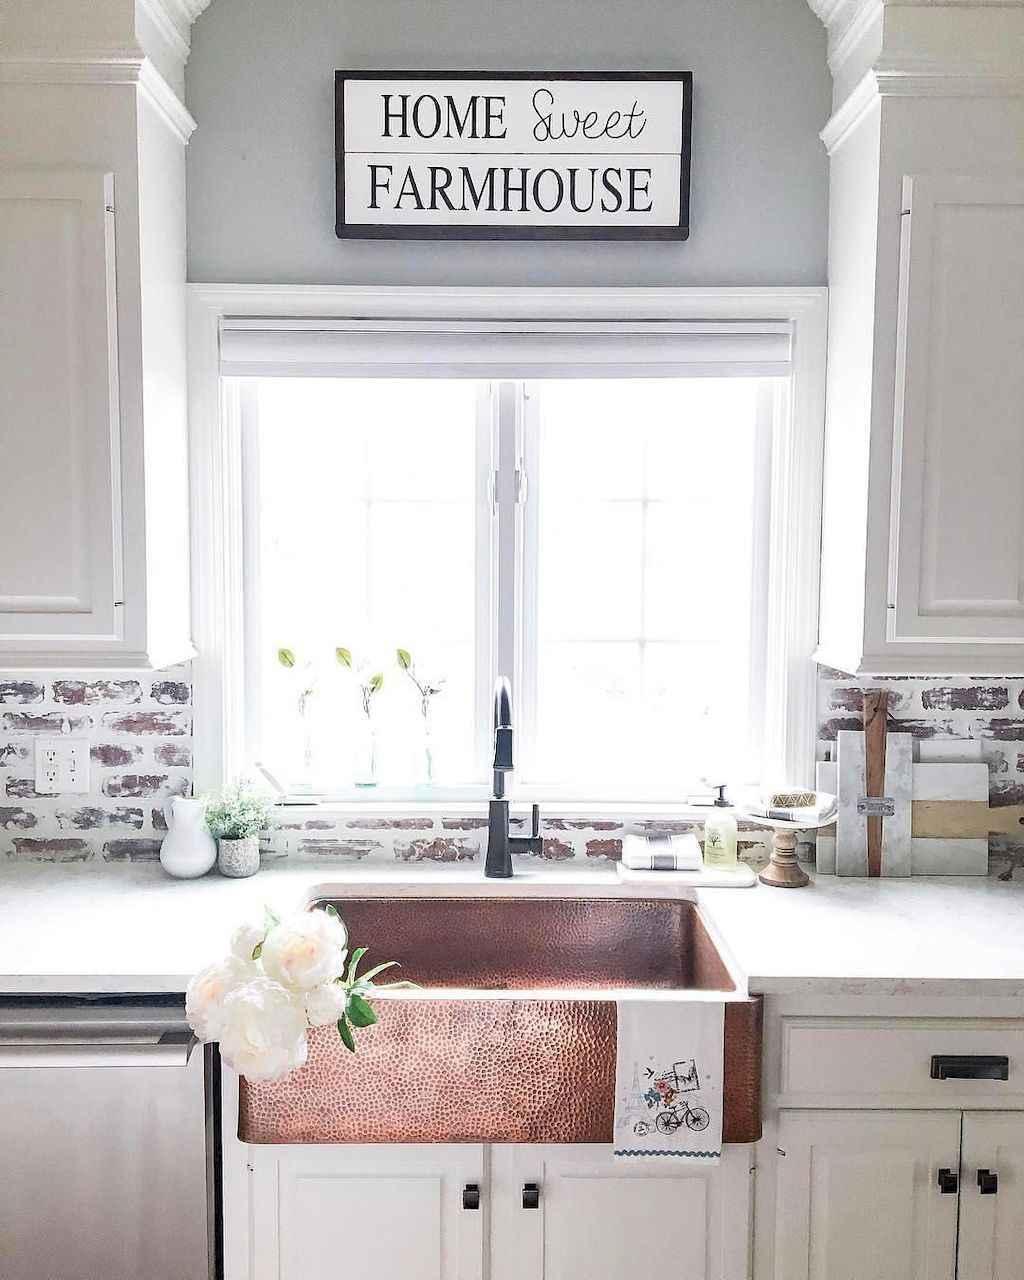 - 60 Fancy Farmhouse Kitchen Backsplash Decor Ideas (16) - Roomadness.com